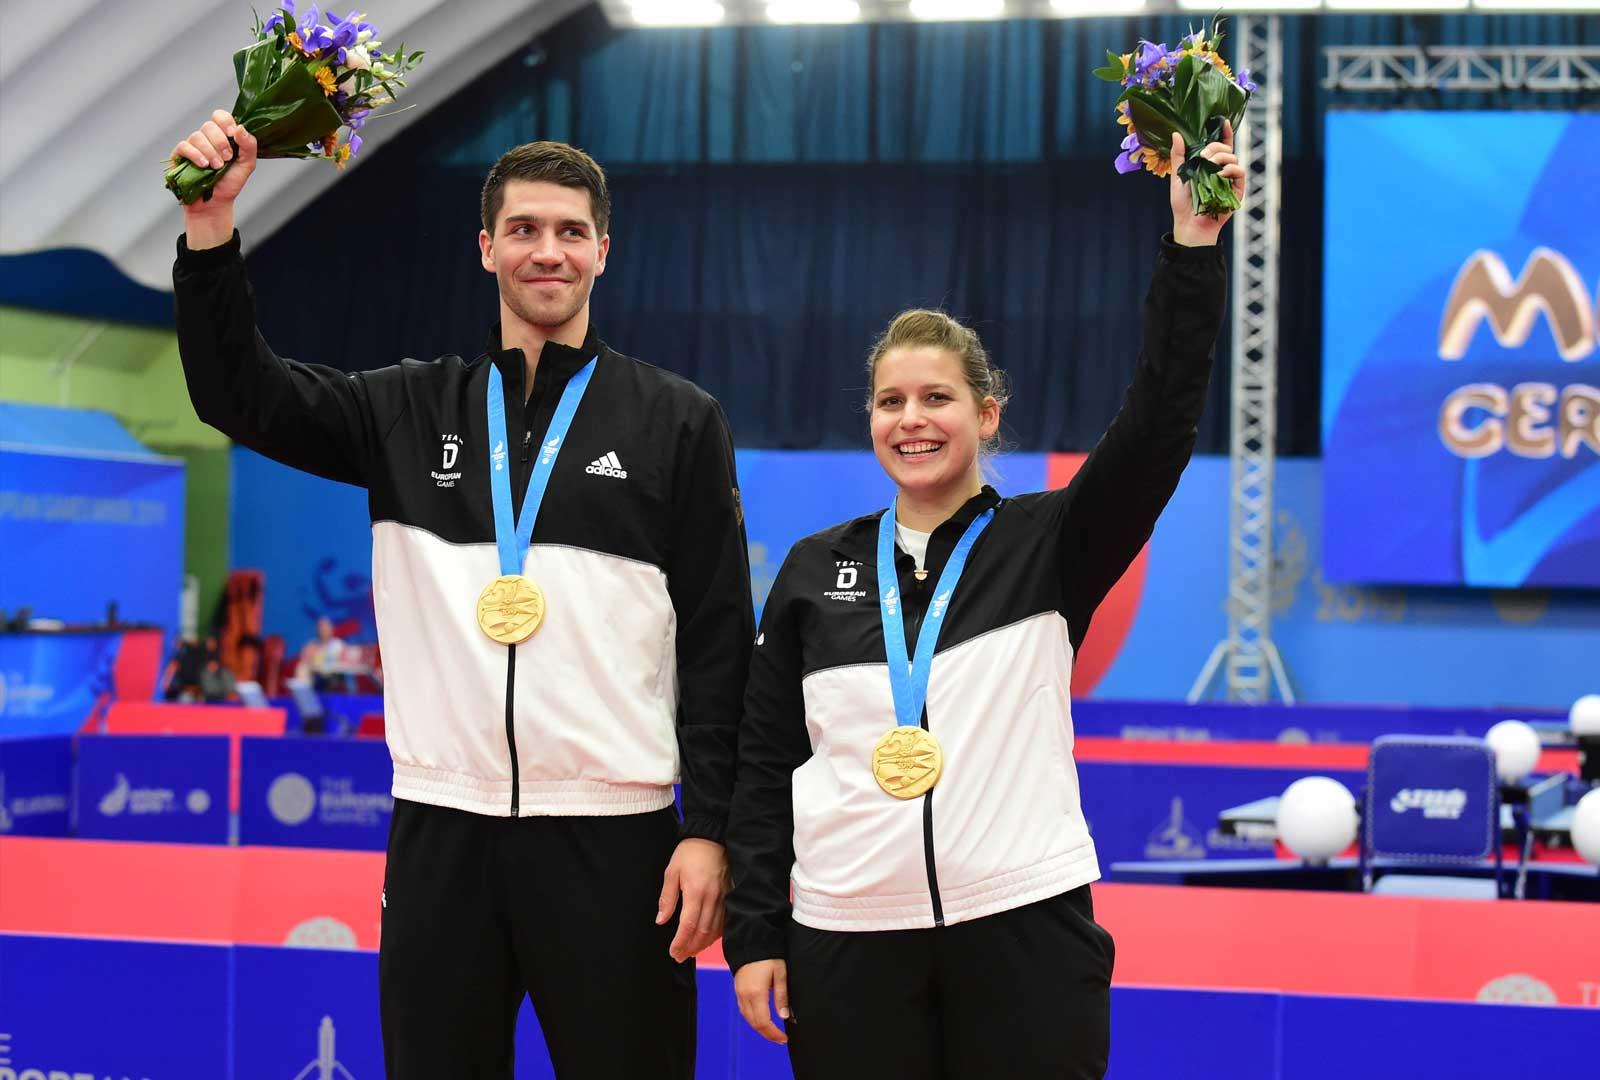 Goldmedaille Mixed European Games 2019 in Minsk - Foto Manfred Schillings